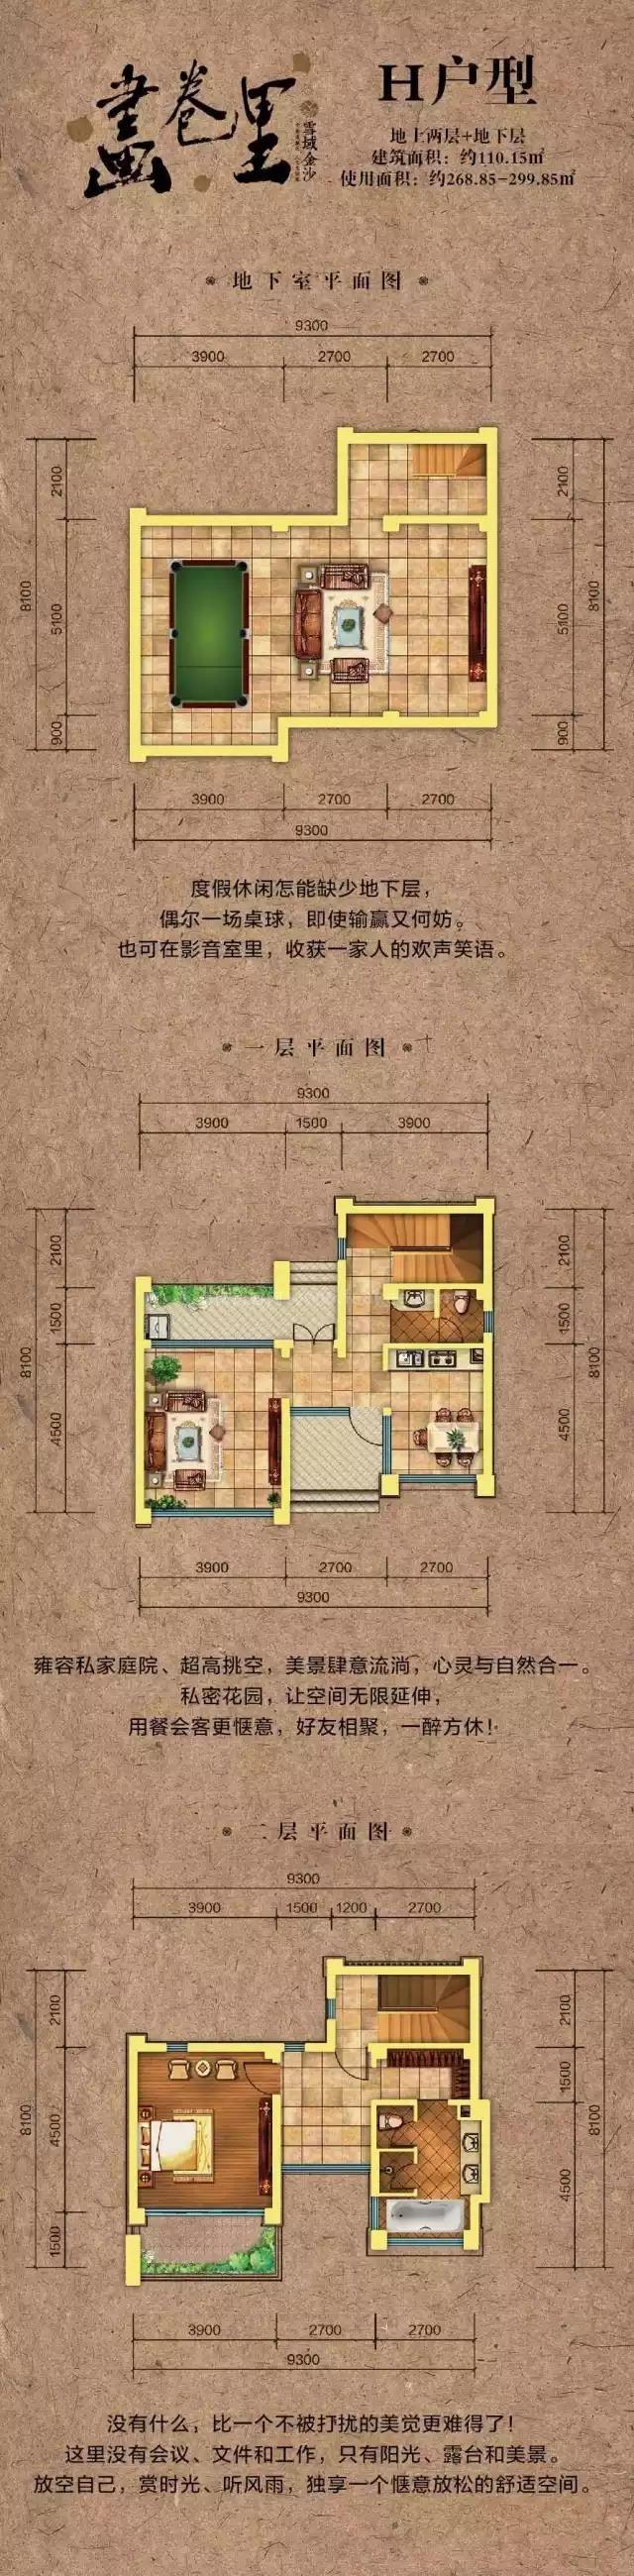 H户型 地上两层+地下层 建面约110.15㎡